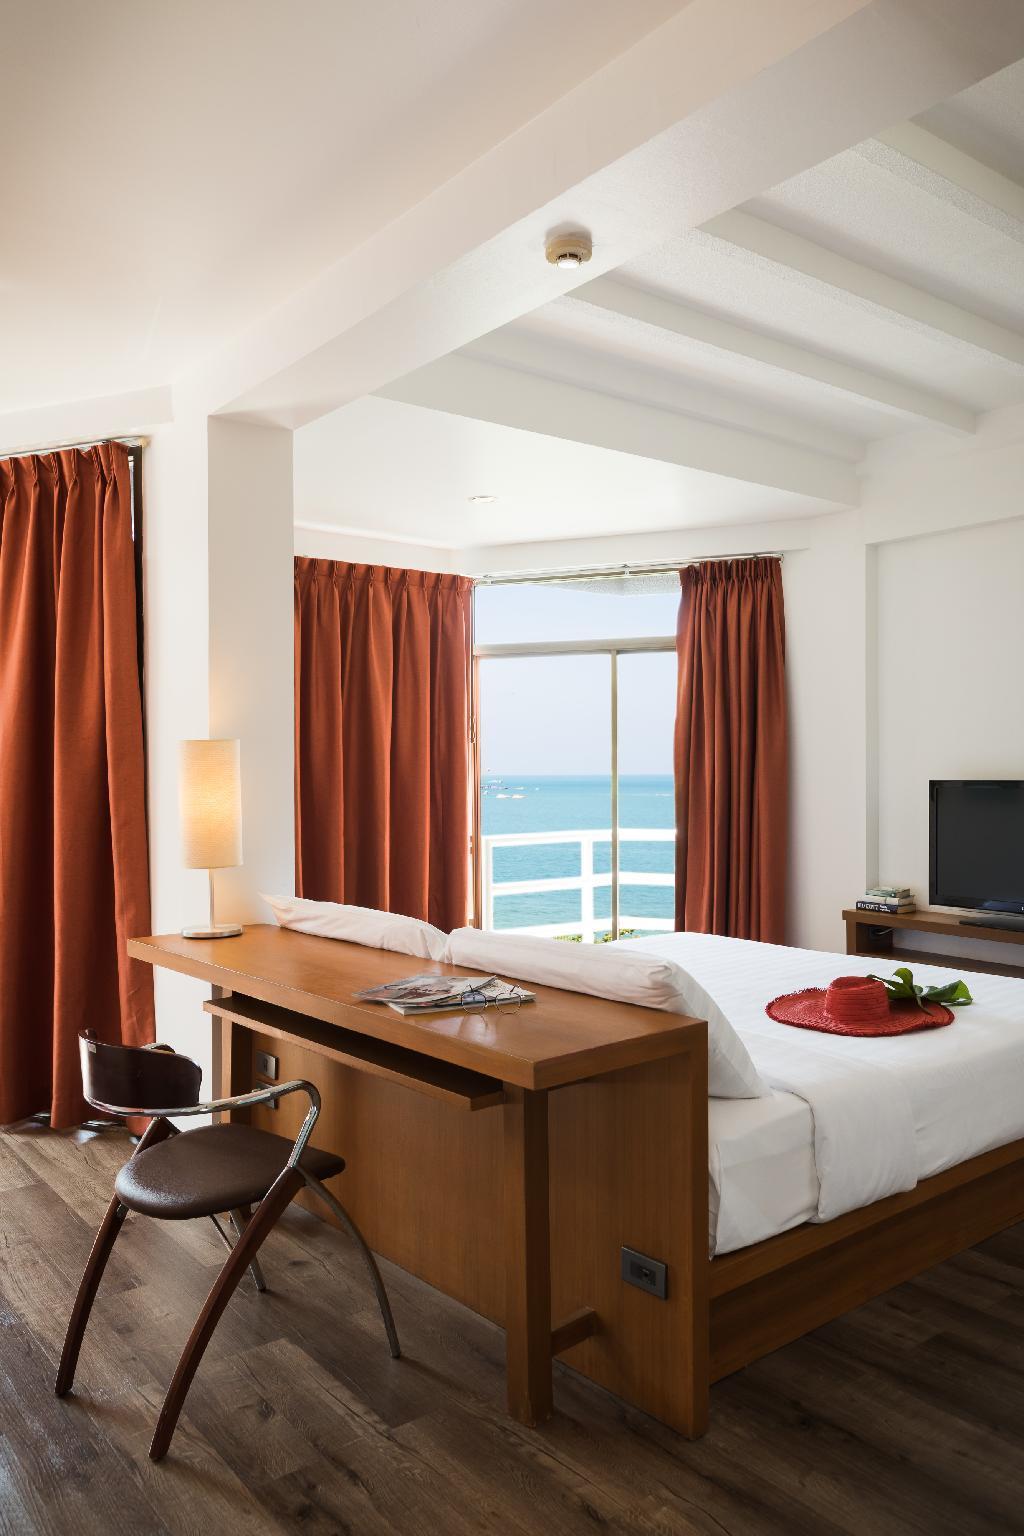 Sandalay Resort Pattaya, Pattaya